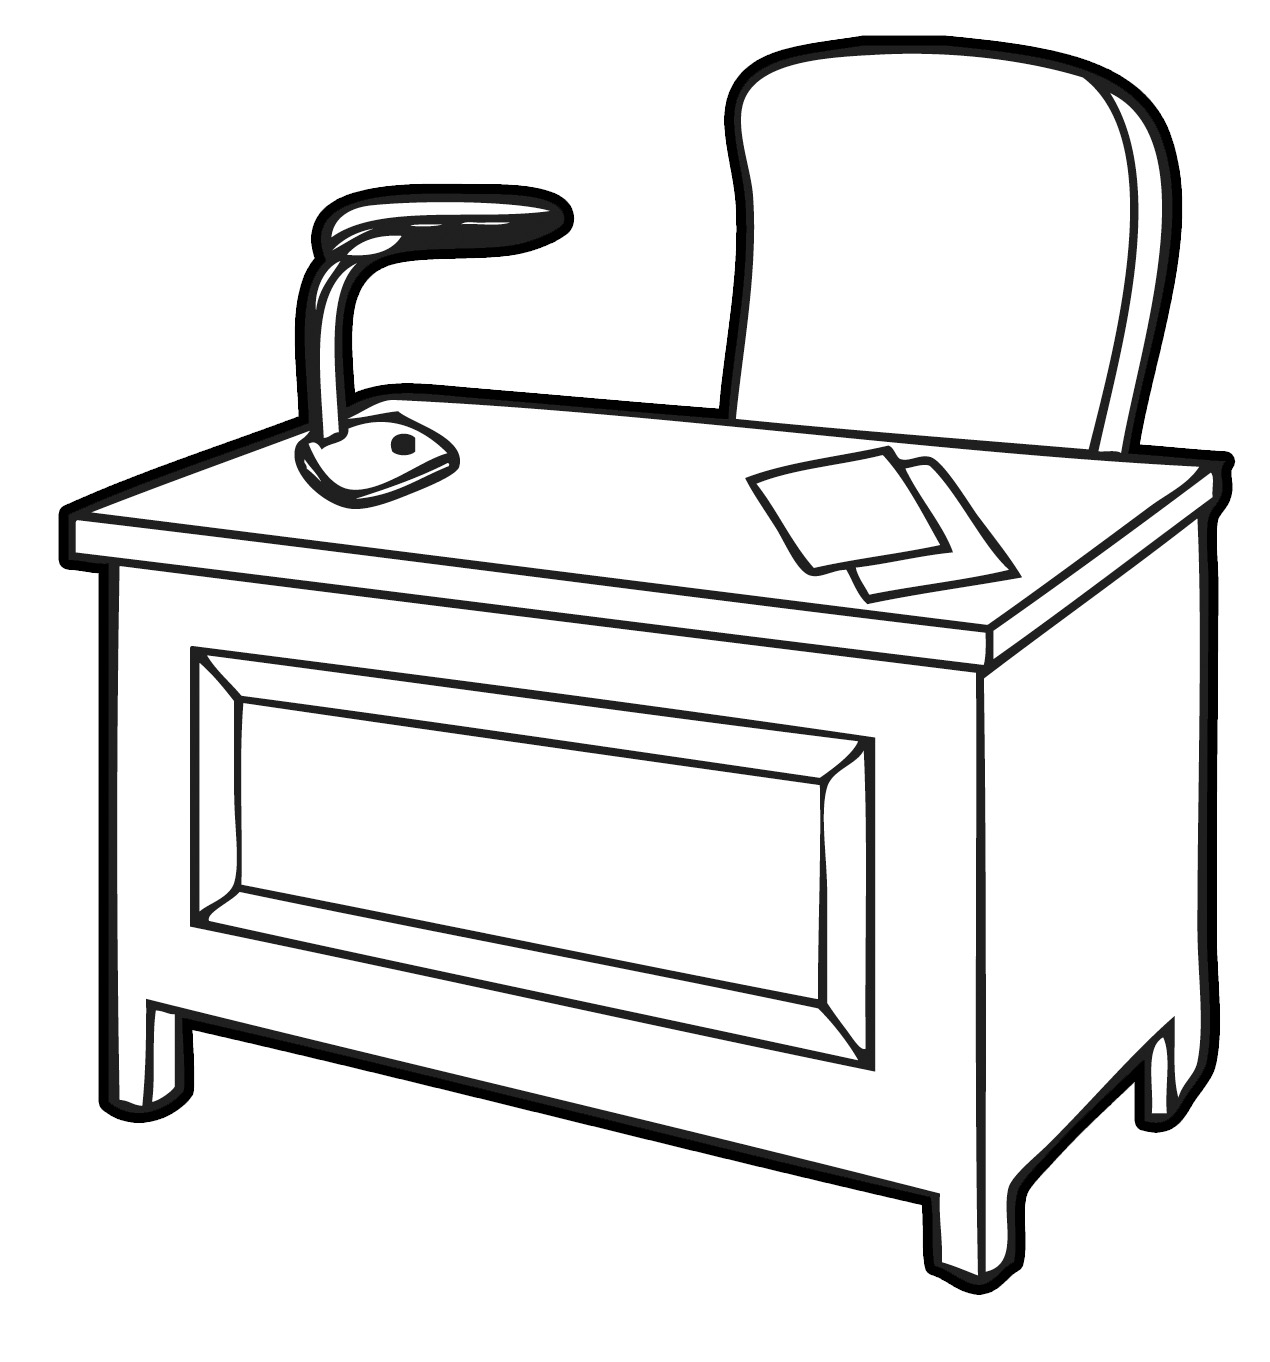 Desk Clipart Desk Clipart .-Desk Clipart Desk Clipart .-12